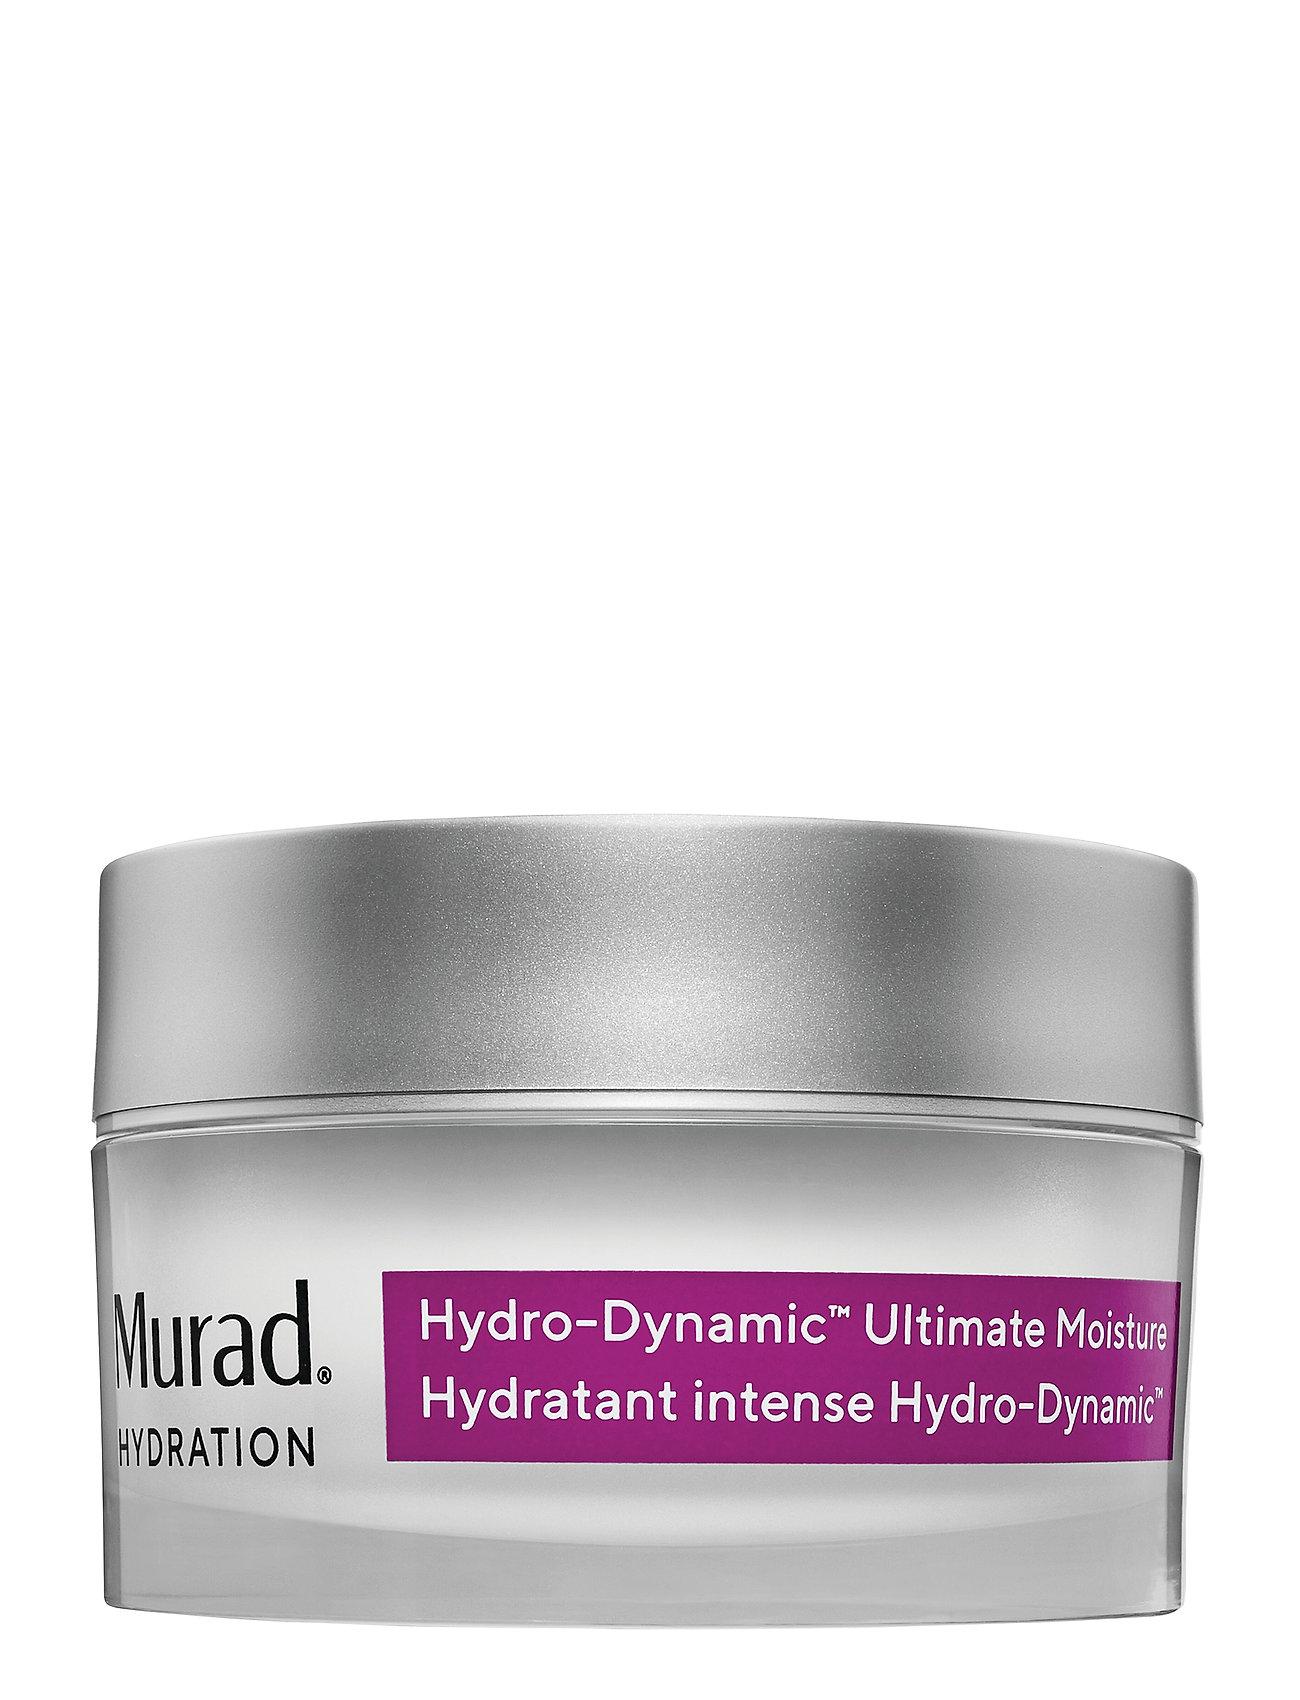 Murad Hydration Hydro-Dynamic Ultimate Moisture - NO COLOUR